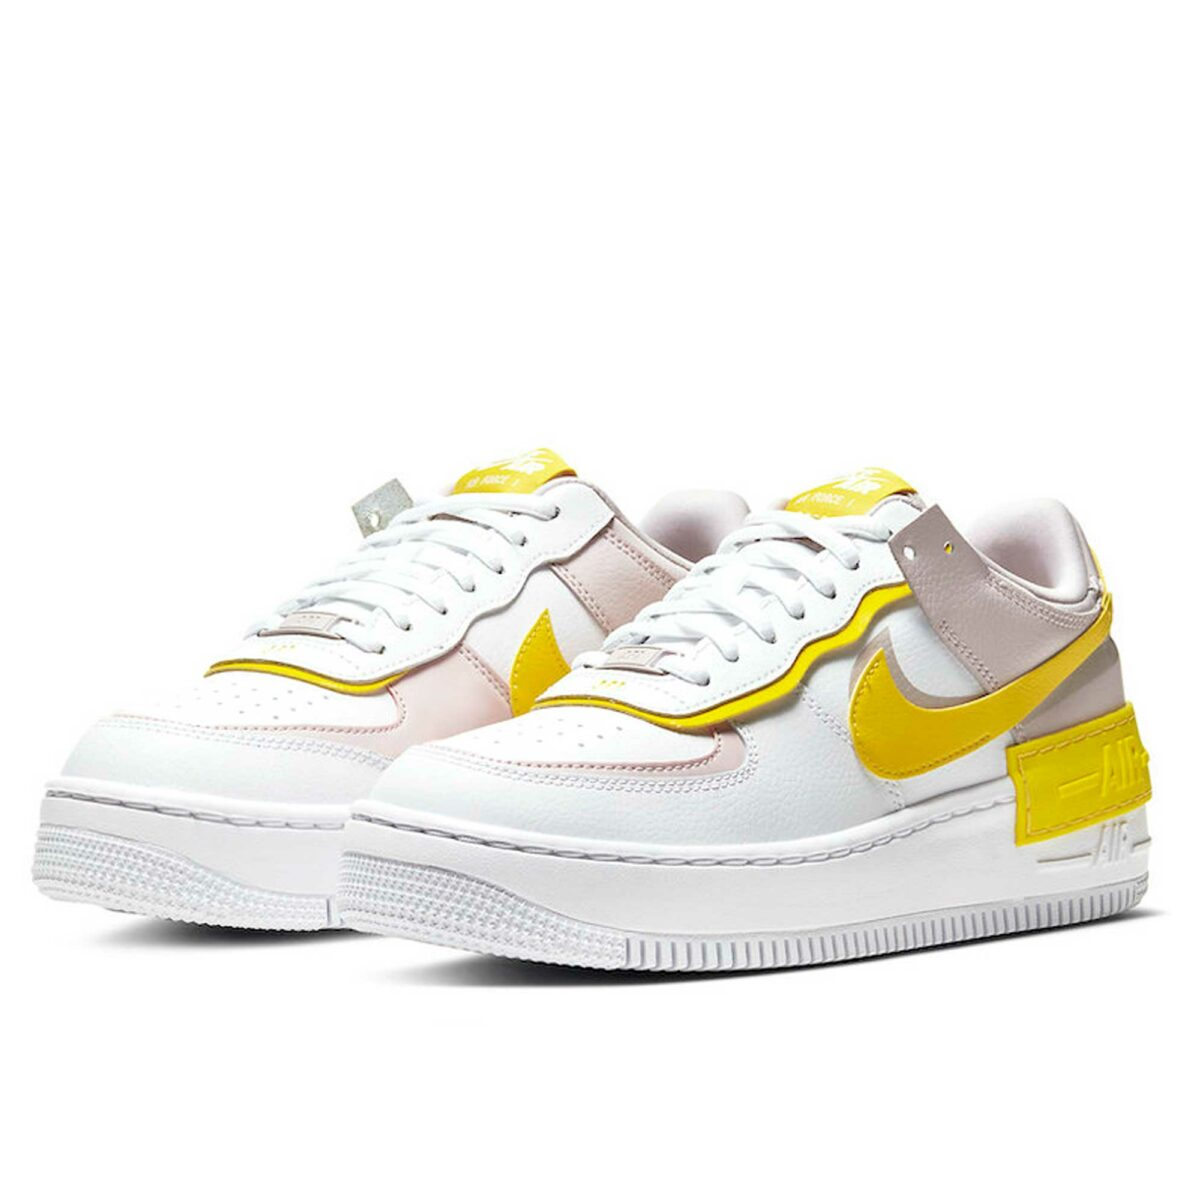 nike air force 1 shadow sunshine yellow cj1641_102 купить